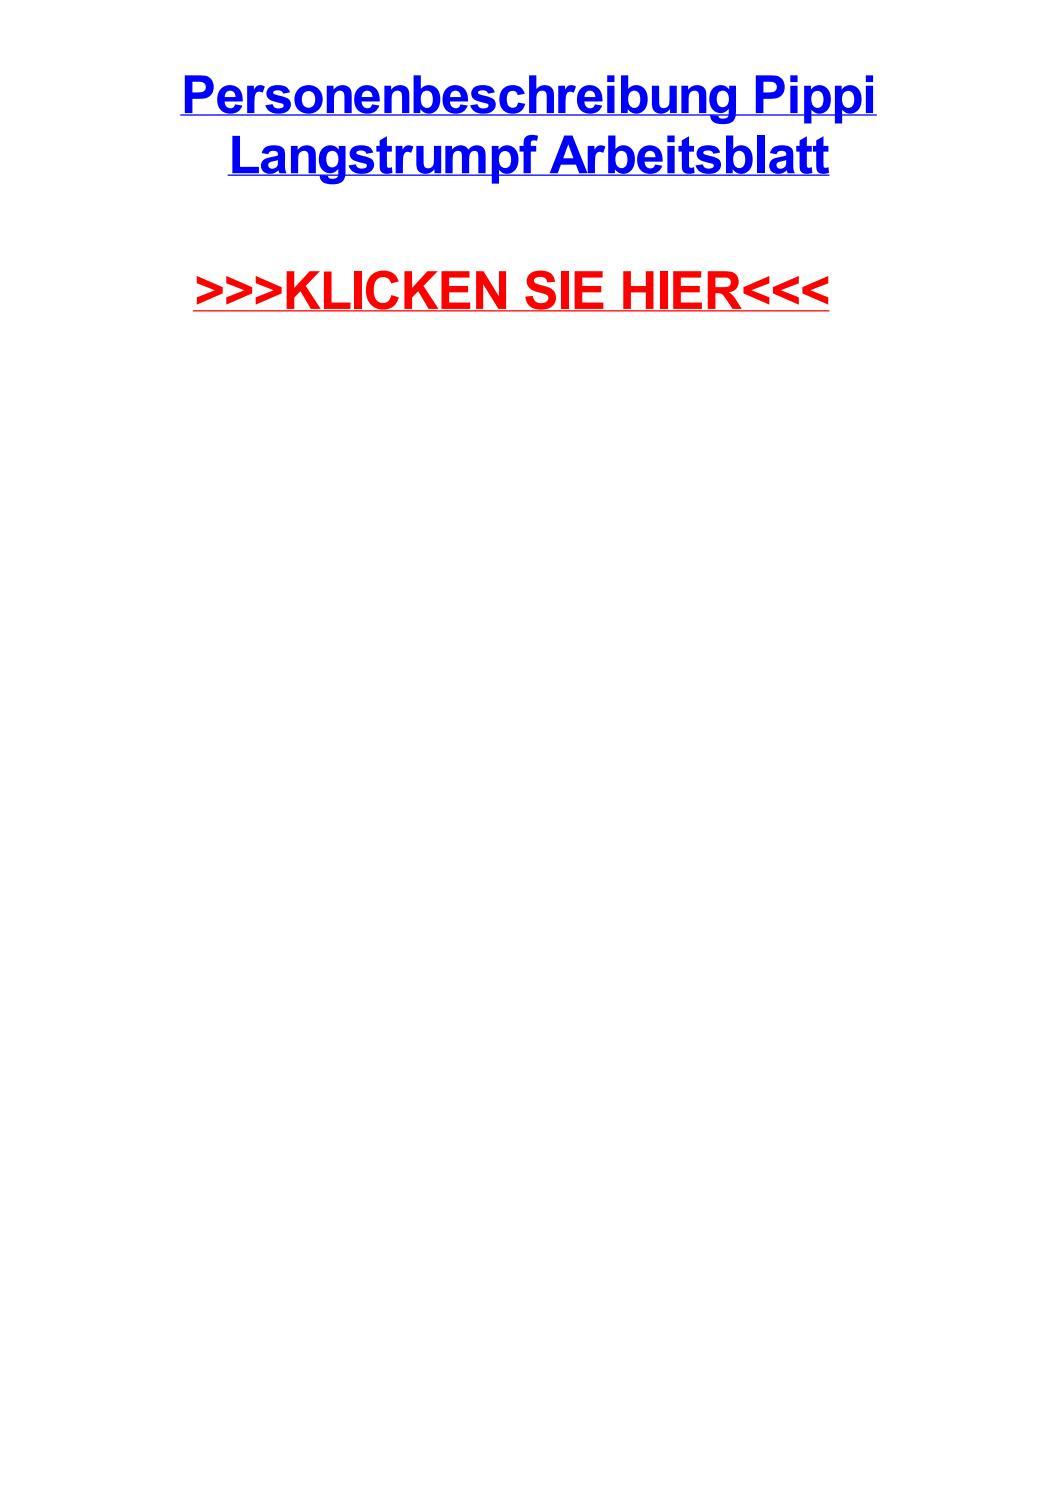 personenbeschreibung pippi langstrumpf arbeitsblatt by